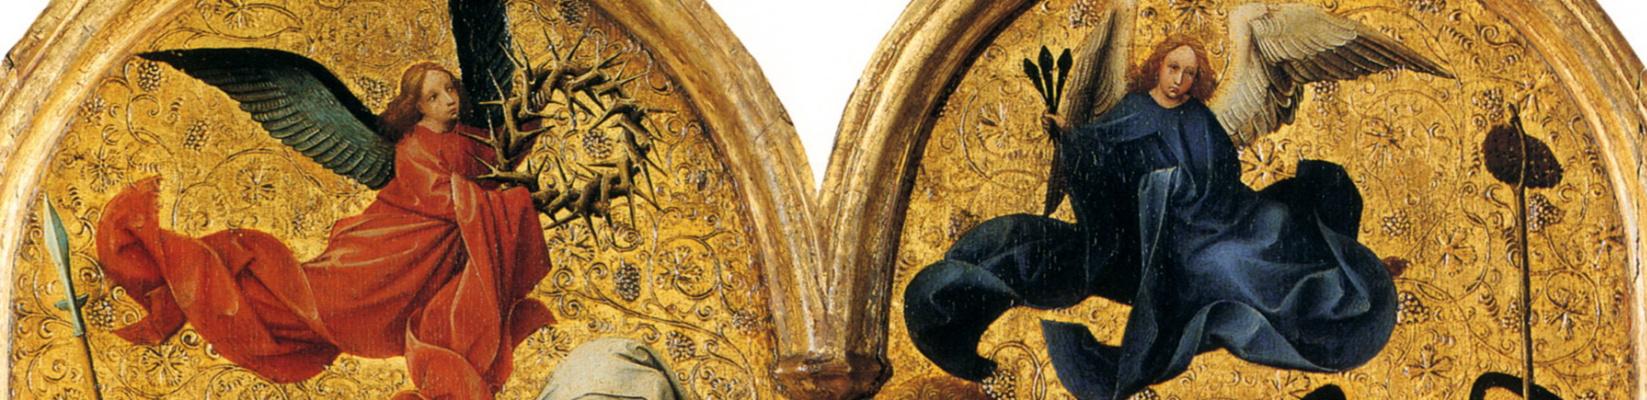 Робер Кампен. Триптих: погребение Христа. Фрагмент: Ангелы над гробницей